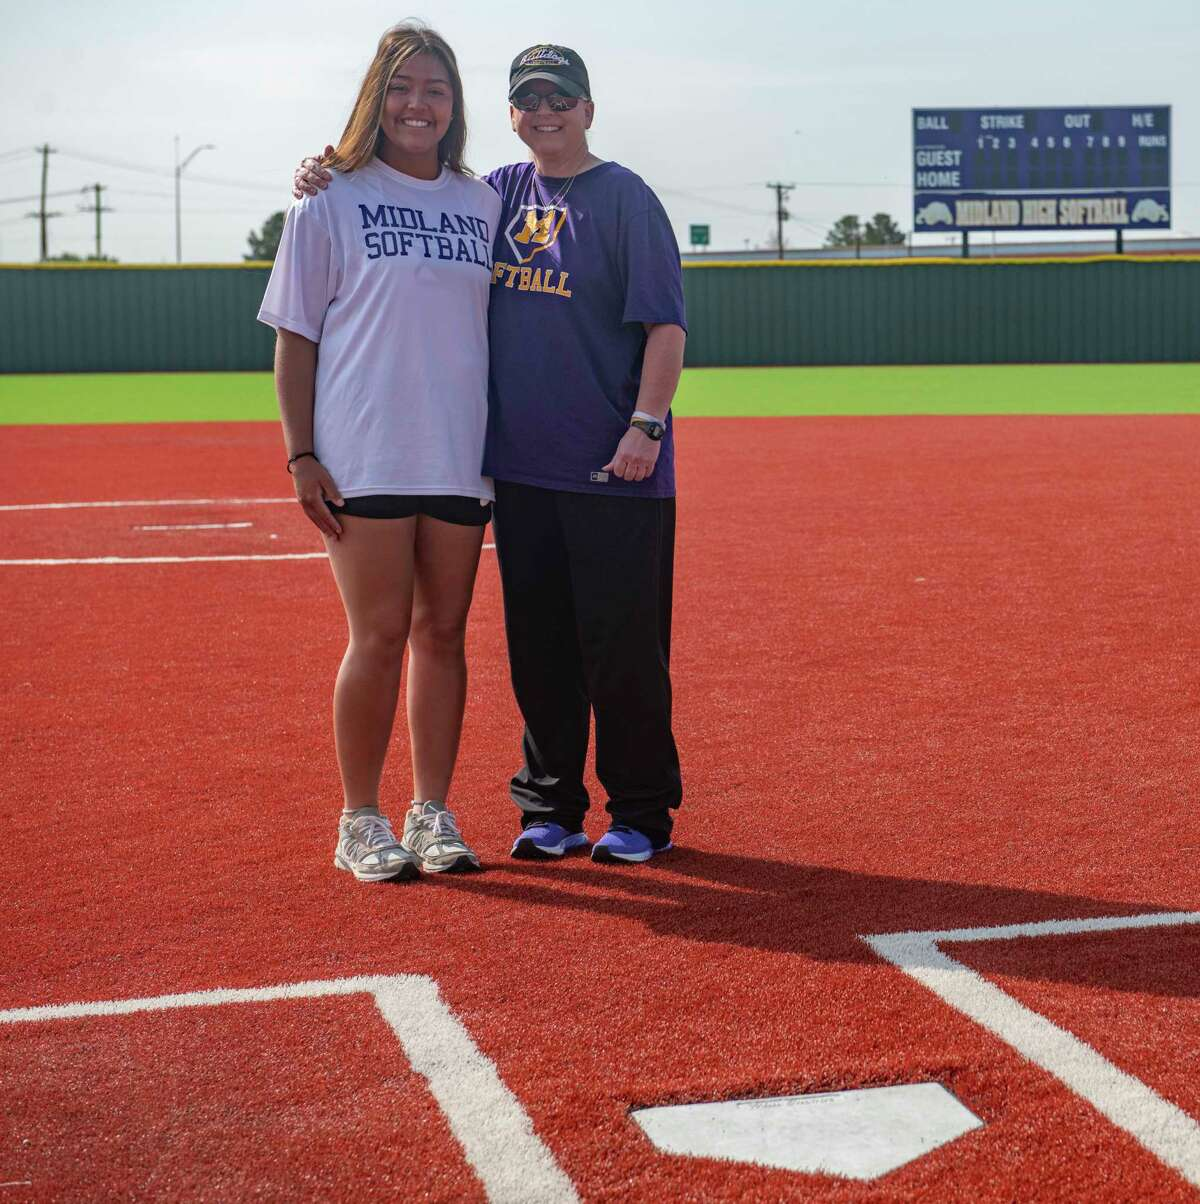 MRT softball player of the year Midland High's Alex Aguilar and MRT coach of the year MHS' Shawnda Vines. 07/19/2021 Tim Fischer/Reporter-Telegram